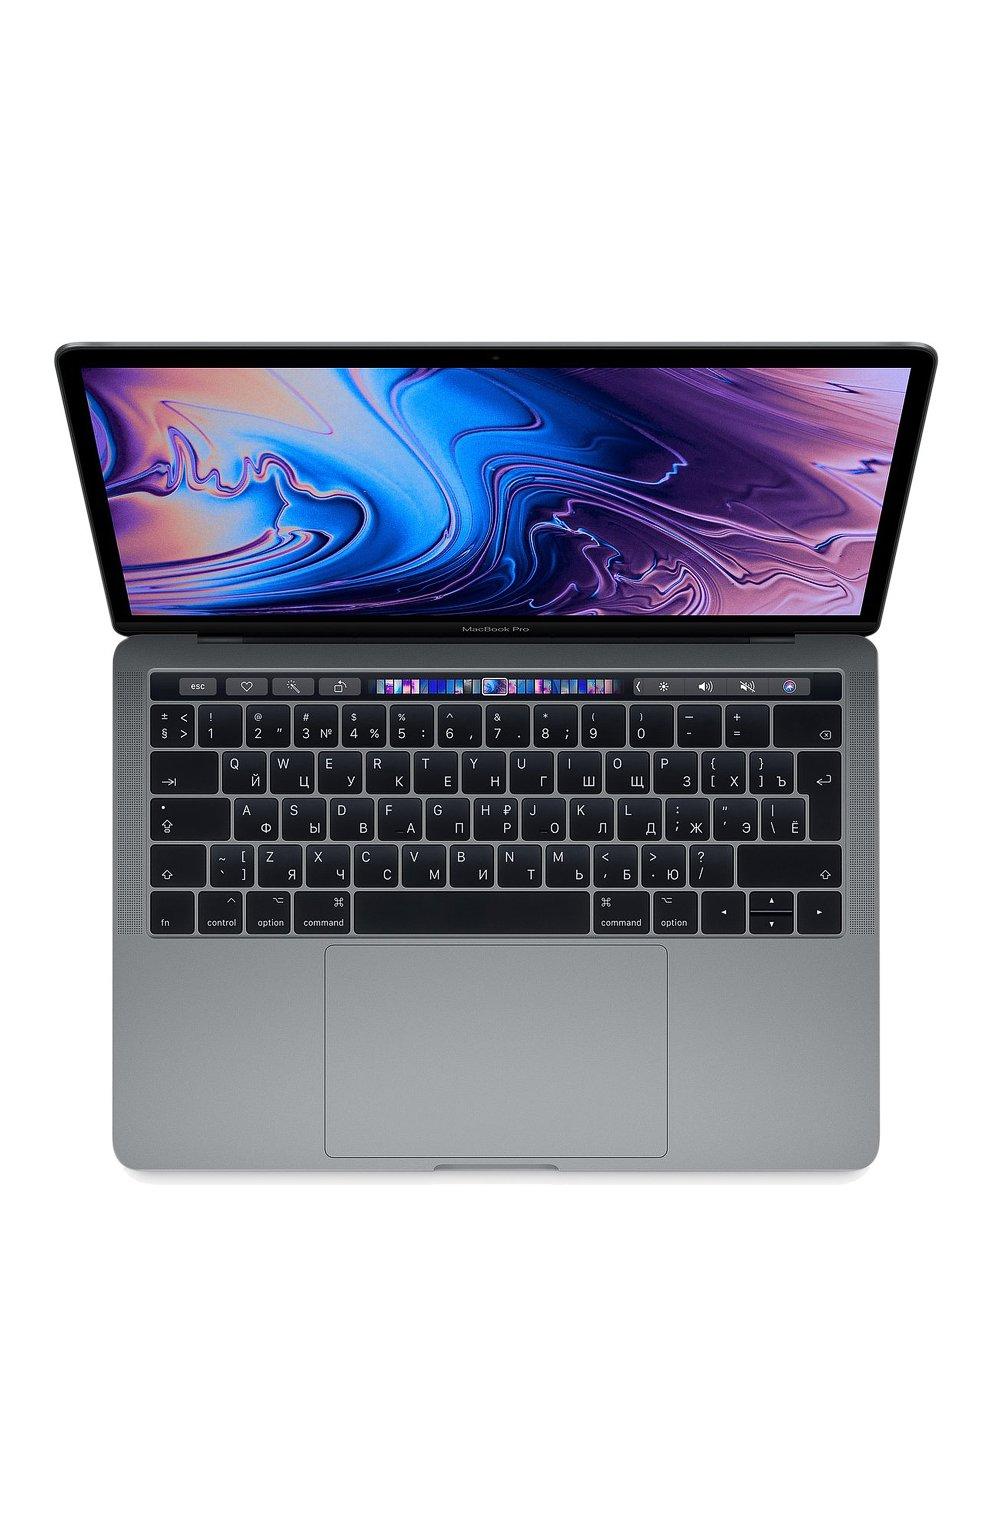 "MacBook Pro 13"" с панелью Touch Bar со встроенным датчиком Touch ID Quad-Core i5 2.3GHz 512GB Space Gray Apple    Фото №1"